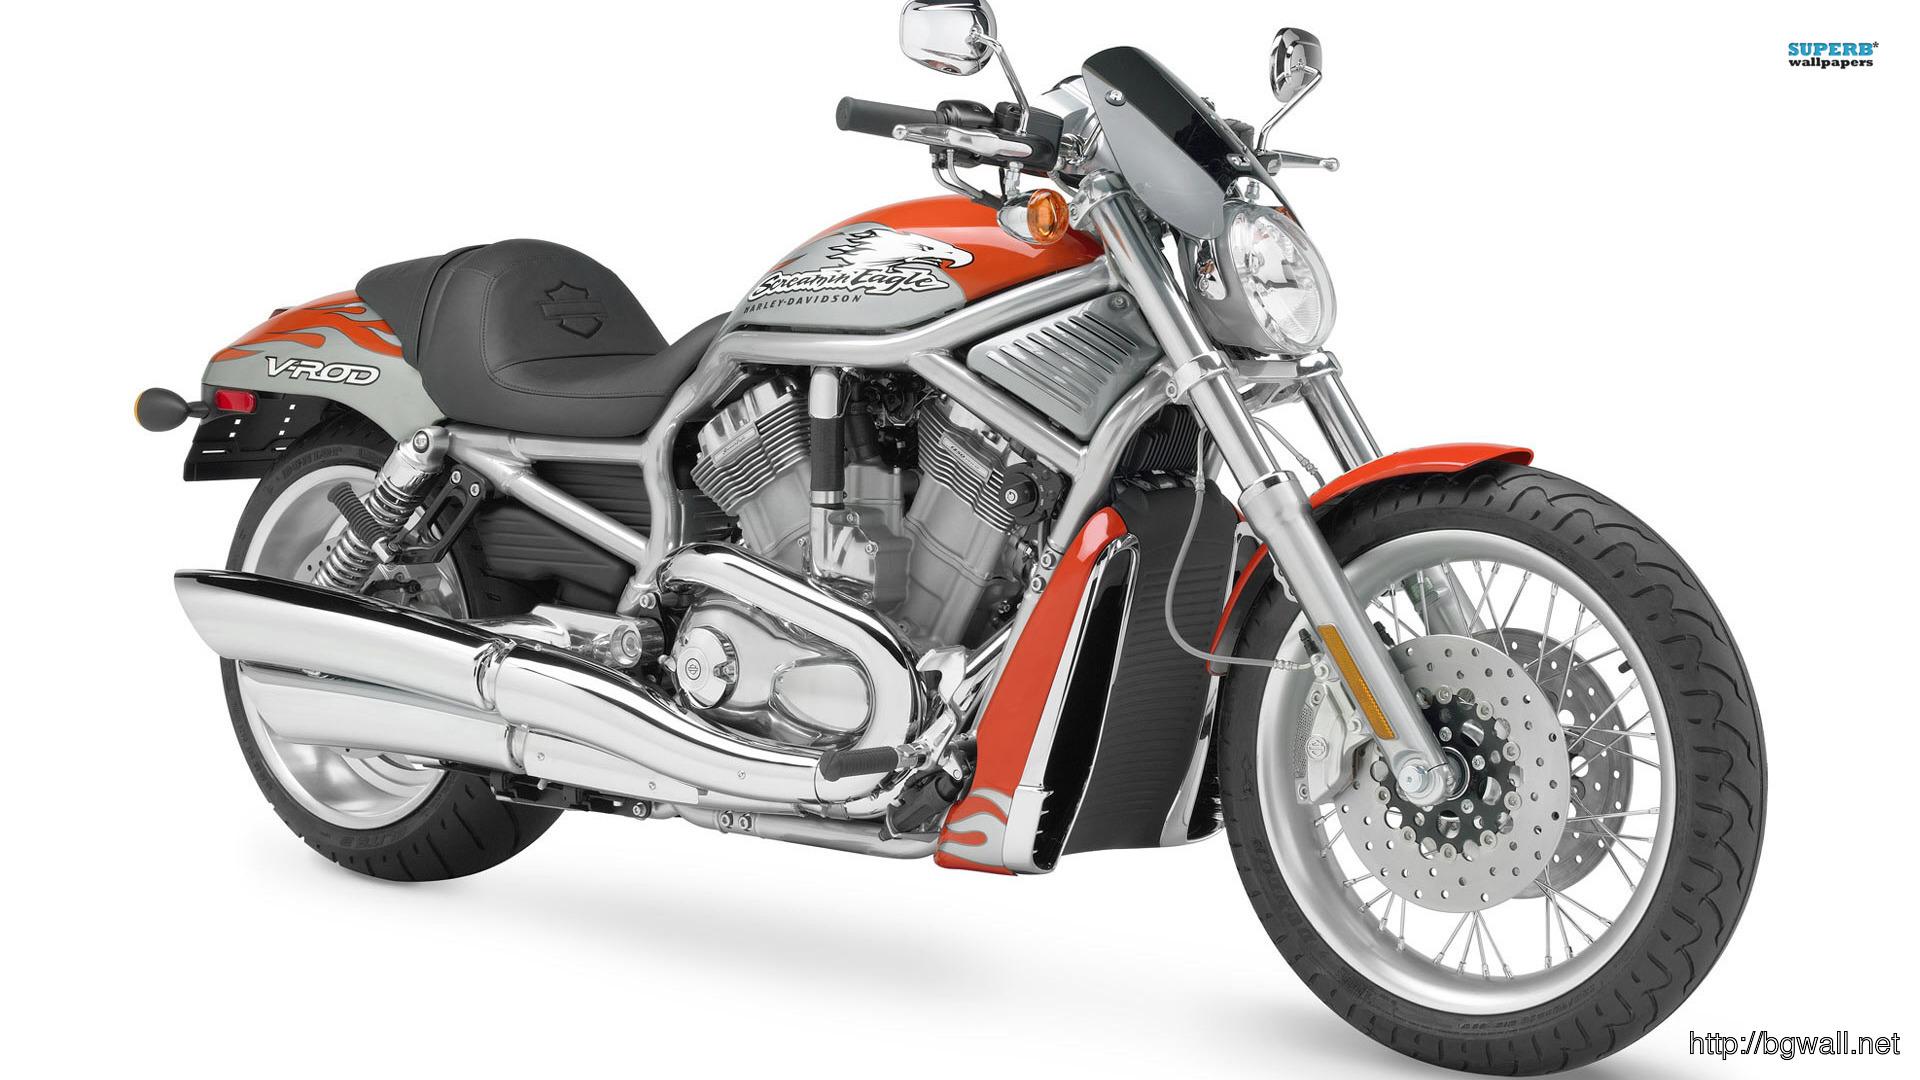 Harley Davidson Vrscf V Full Size